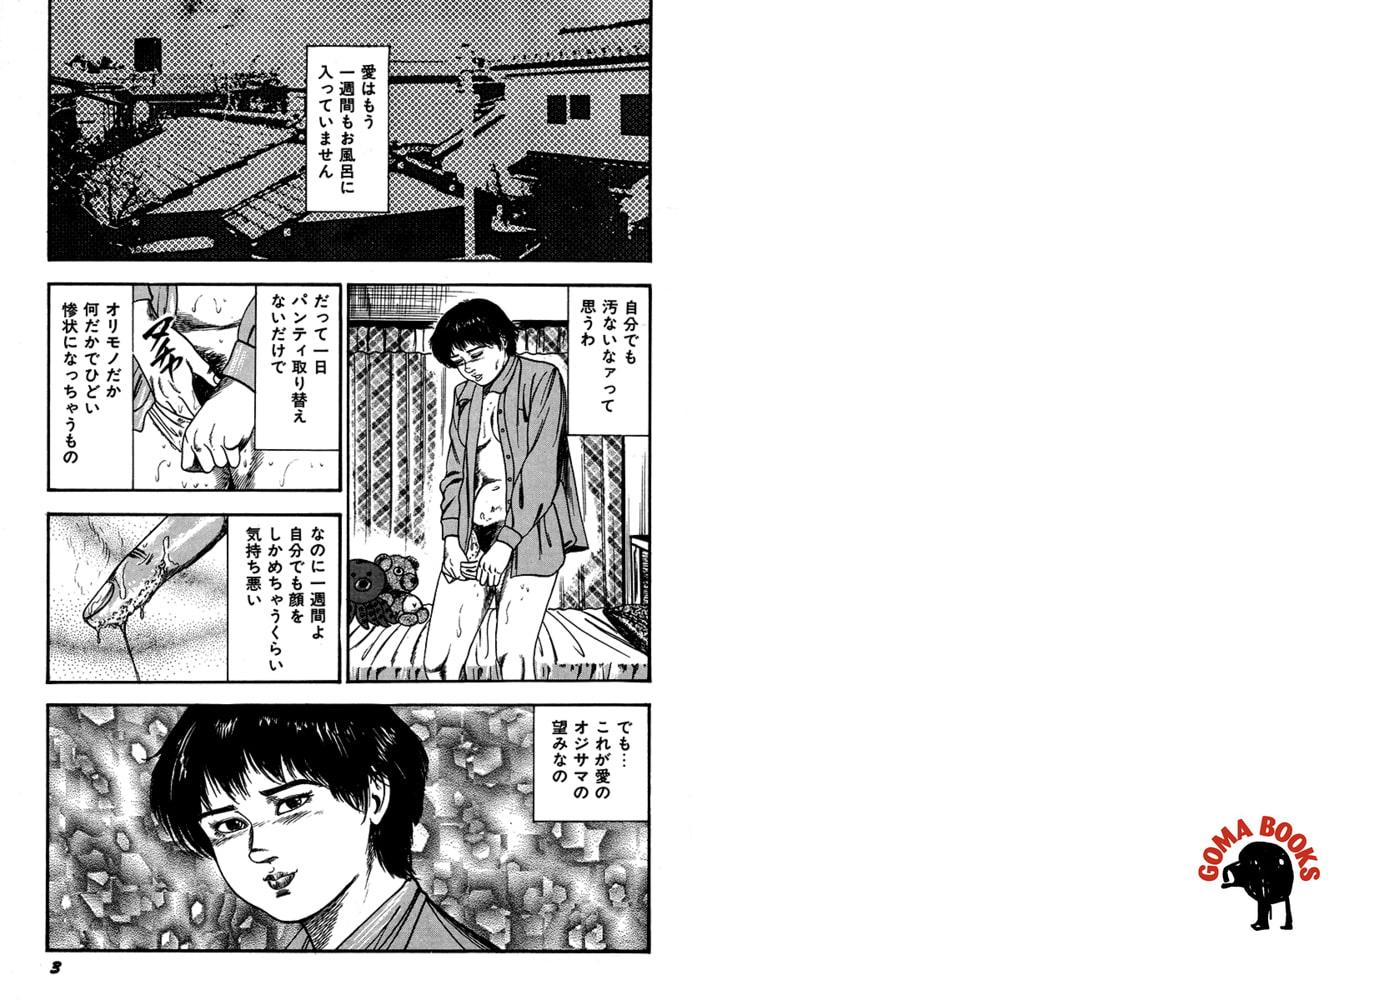 三条友美自選集 美処女・牝犬の喘ぎ(前編)